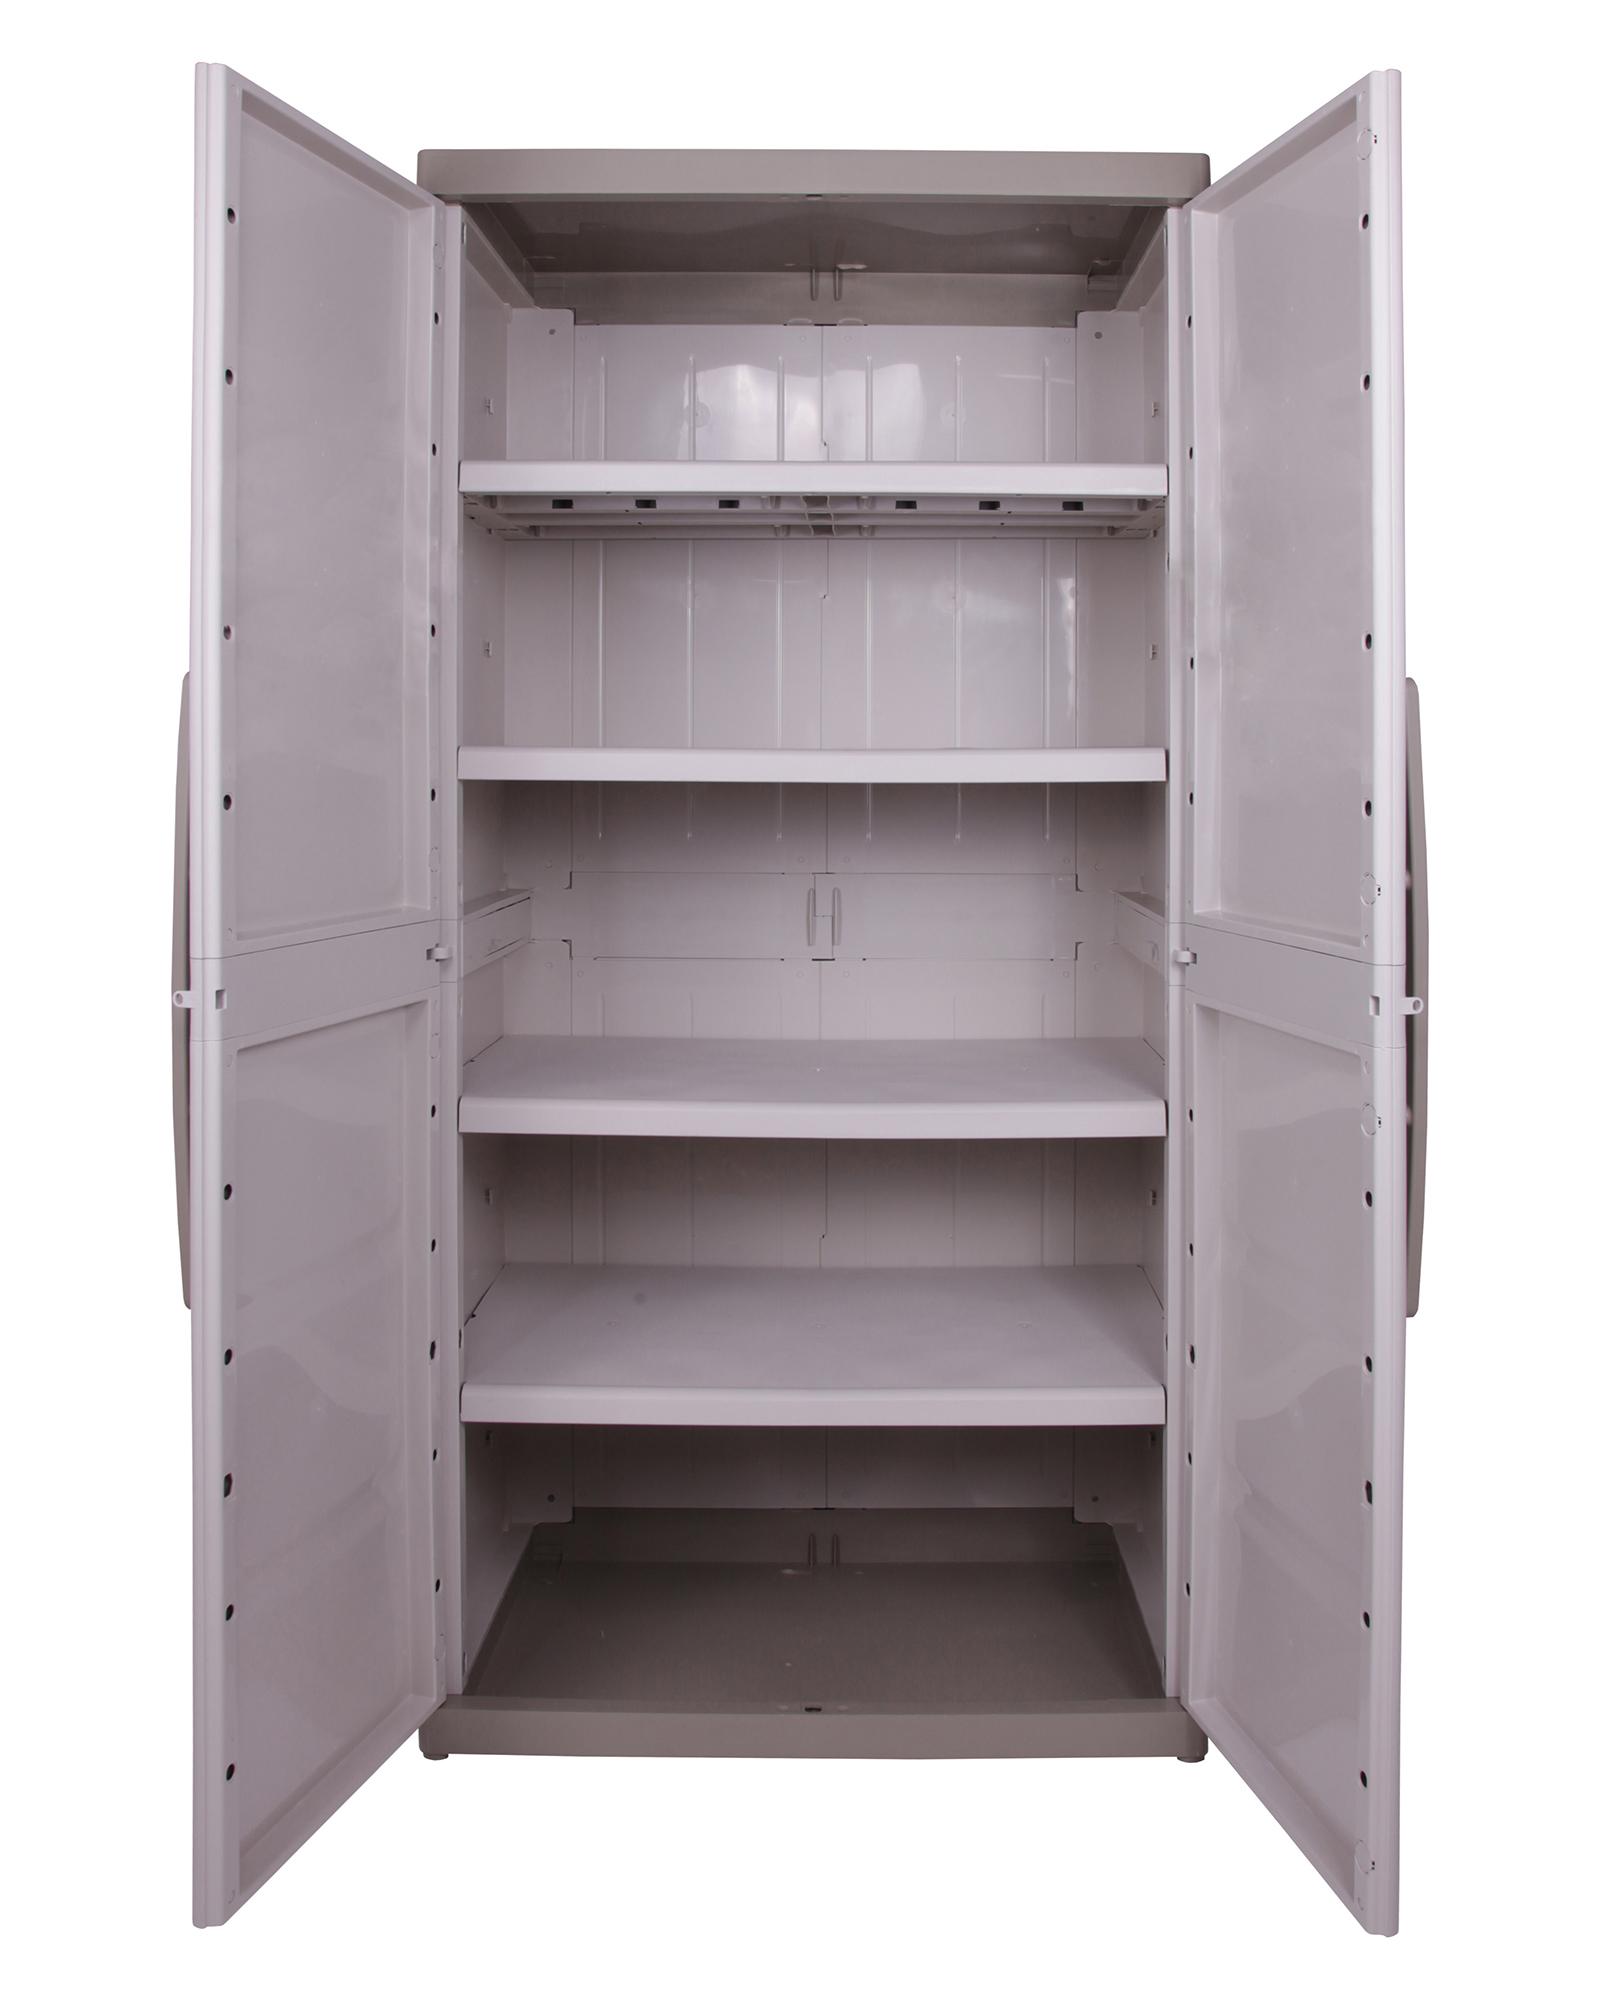 ondis24 kunststoffschrank excellent xl g nstig online kaufen. Black Bedroom Furniture Sets. Home Design Ideas